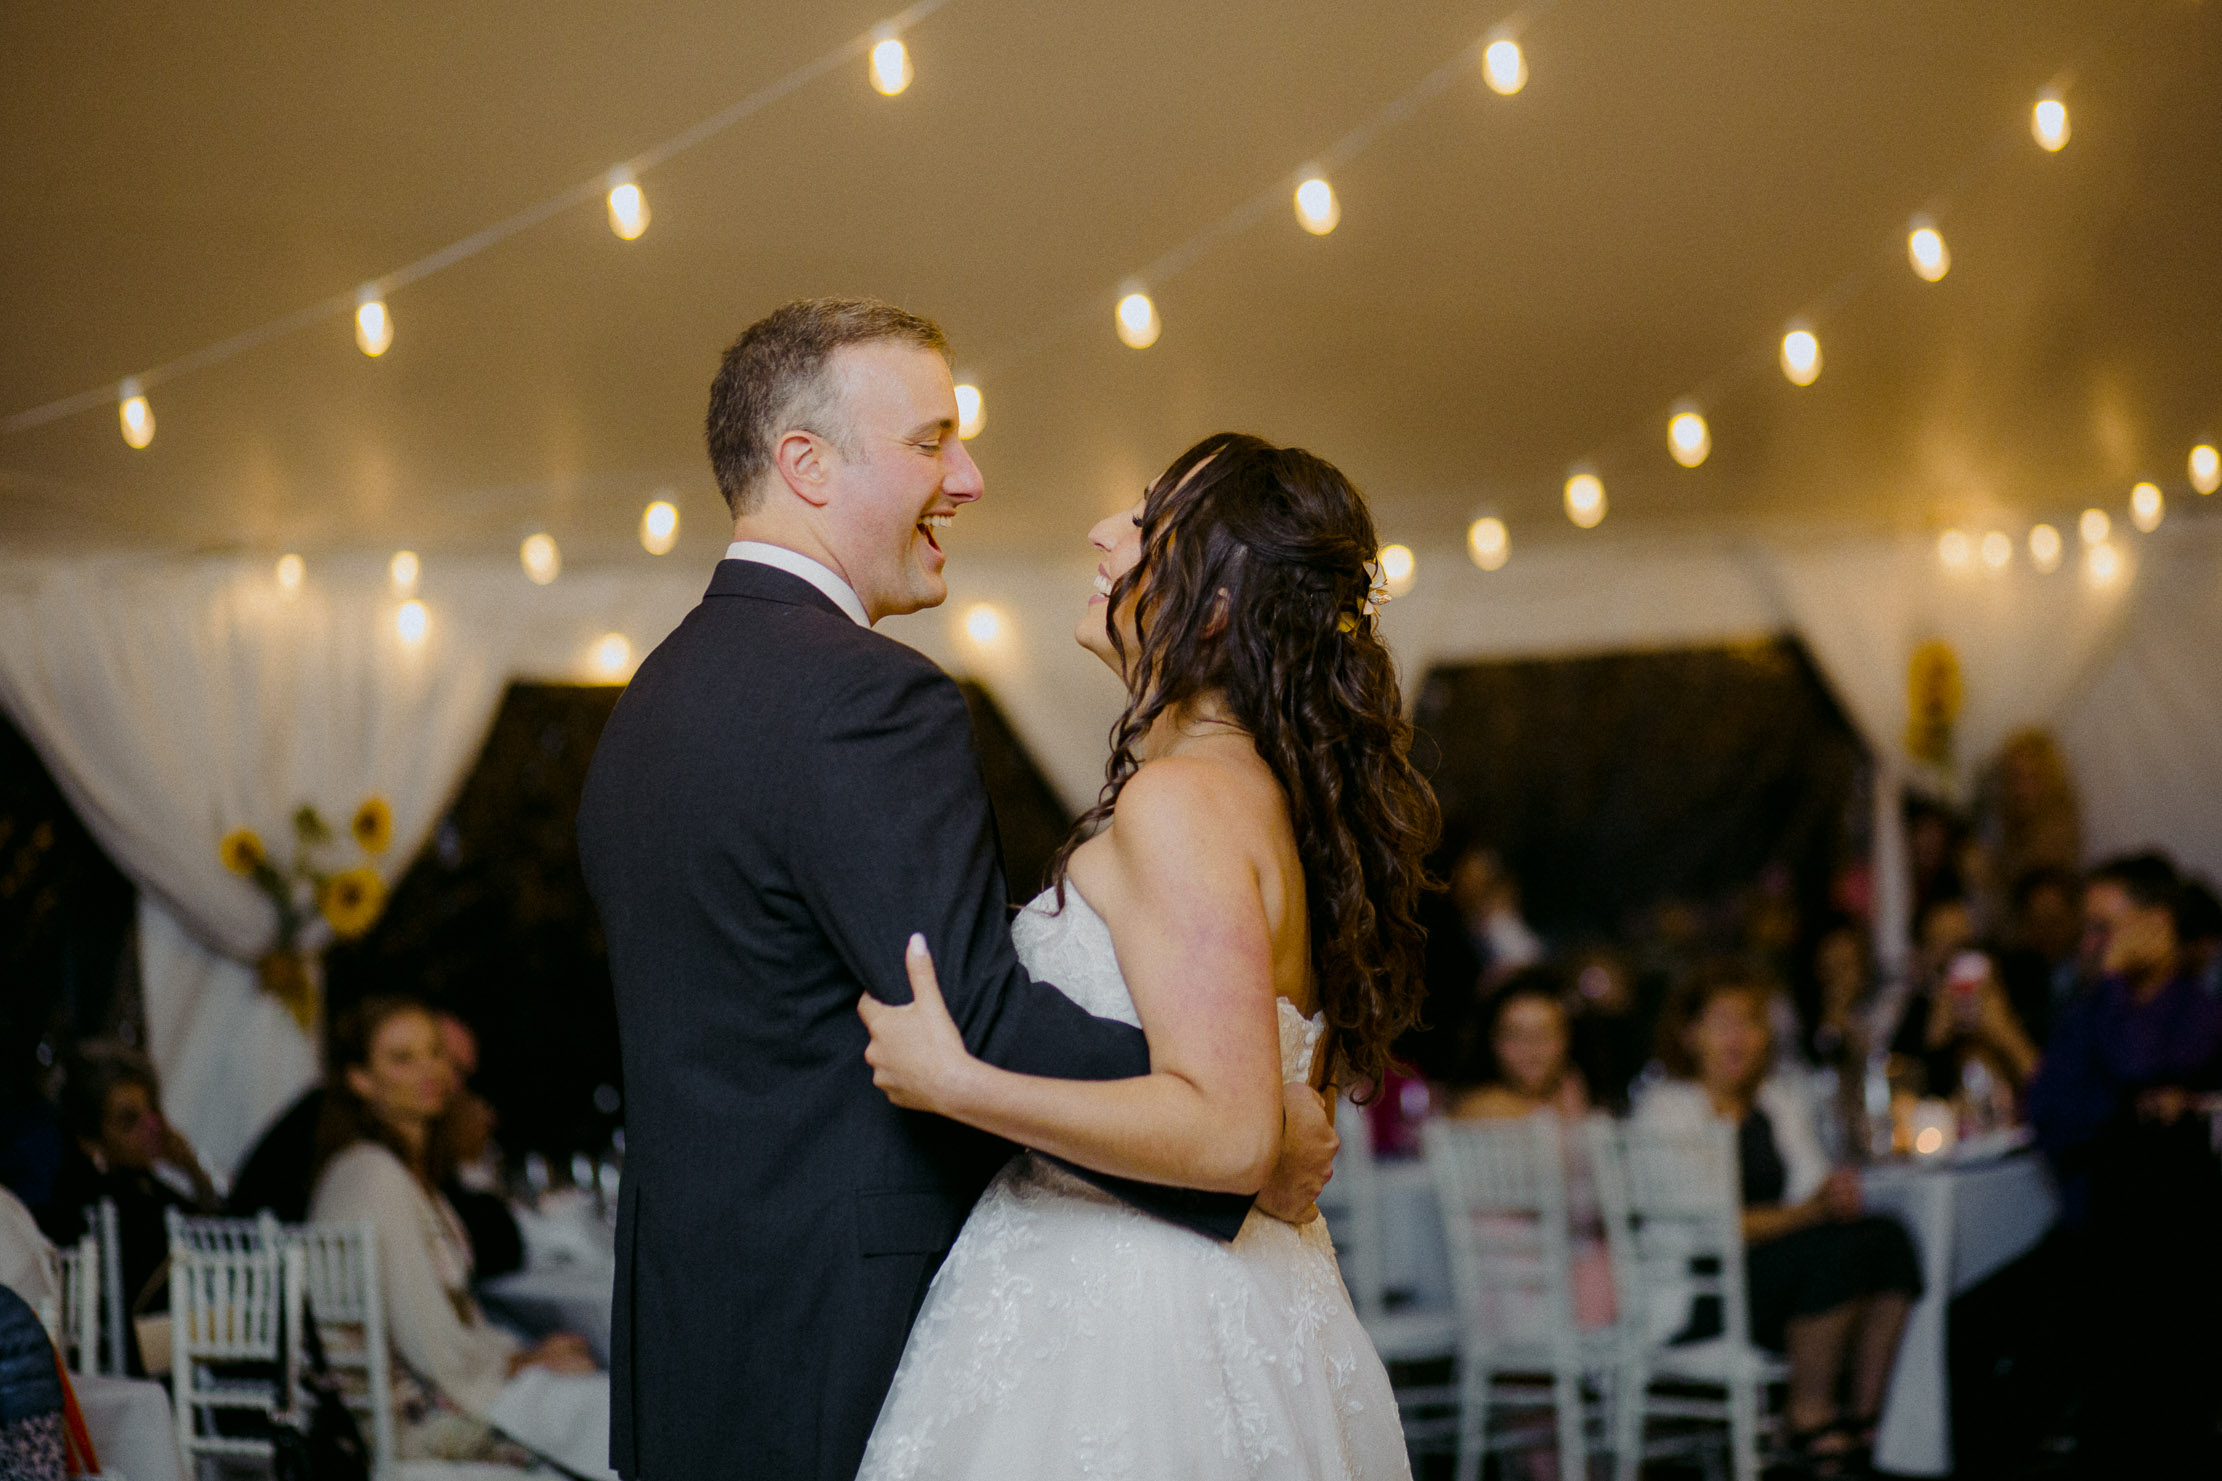 Wings-Castle-Millbrook-NY-Upstate-Wedding-Photographer-1146.jpg